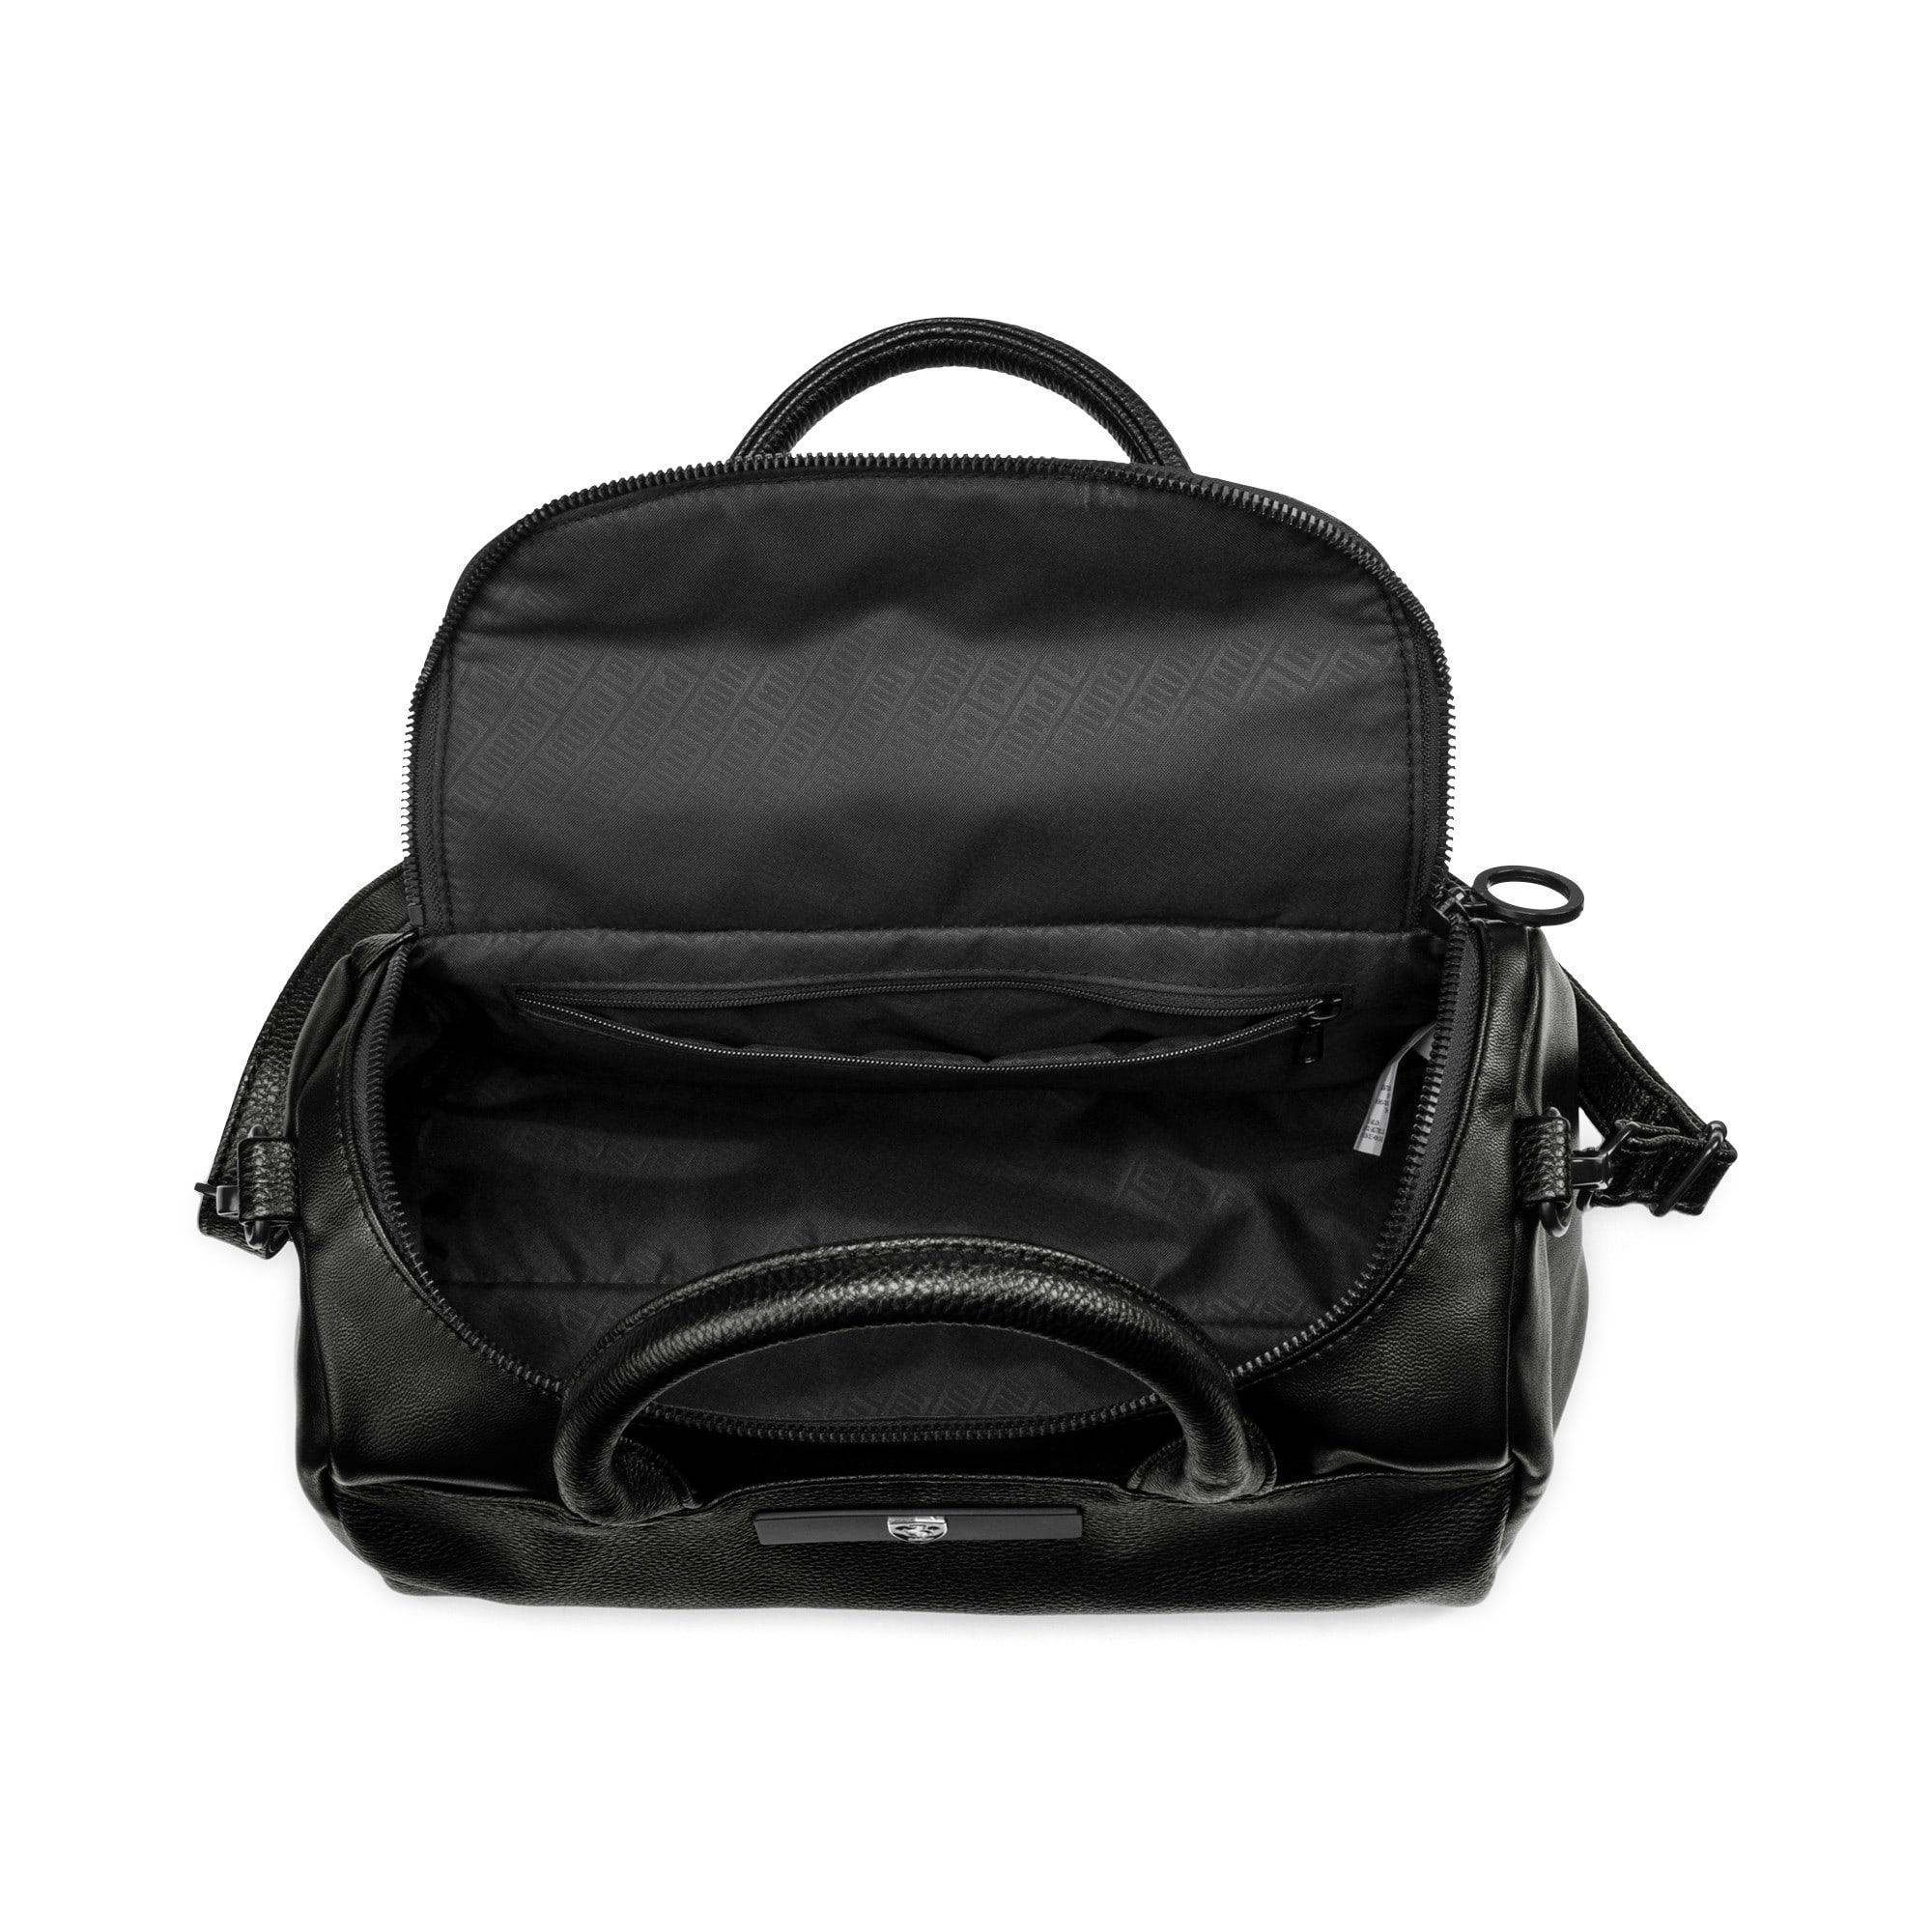 Thumbnail 3 of Ferrari Lifestyle Women's Handbag, Puma Black, medium